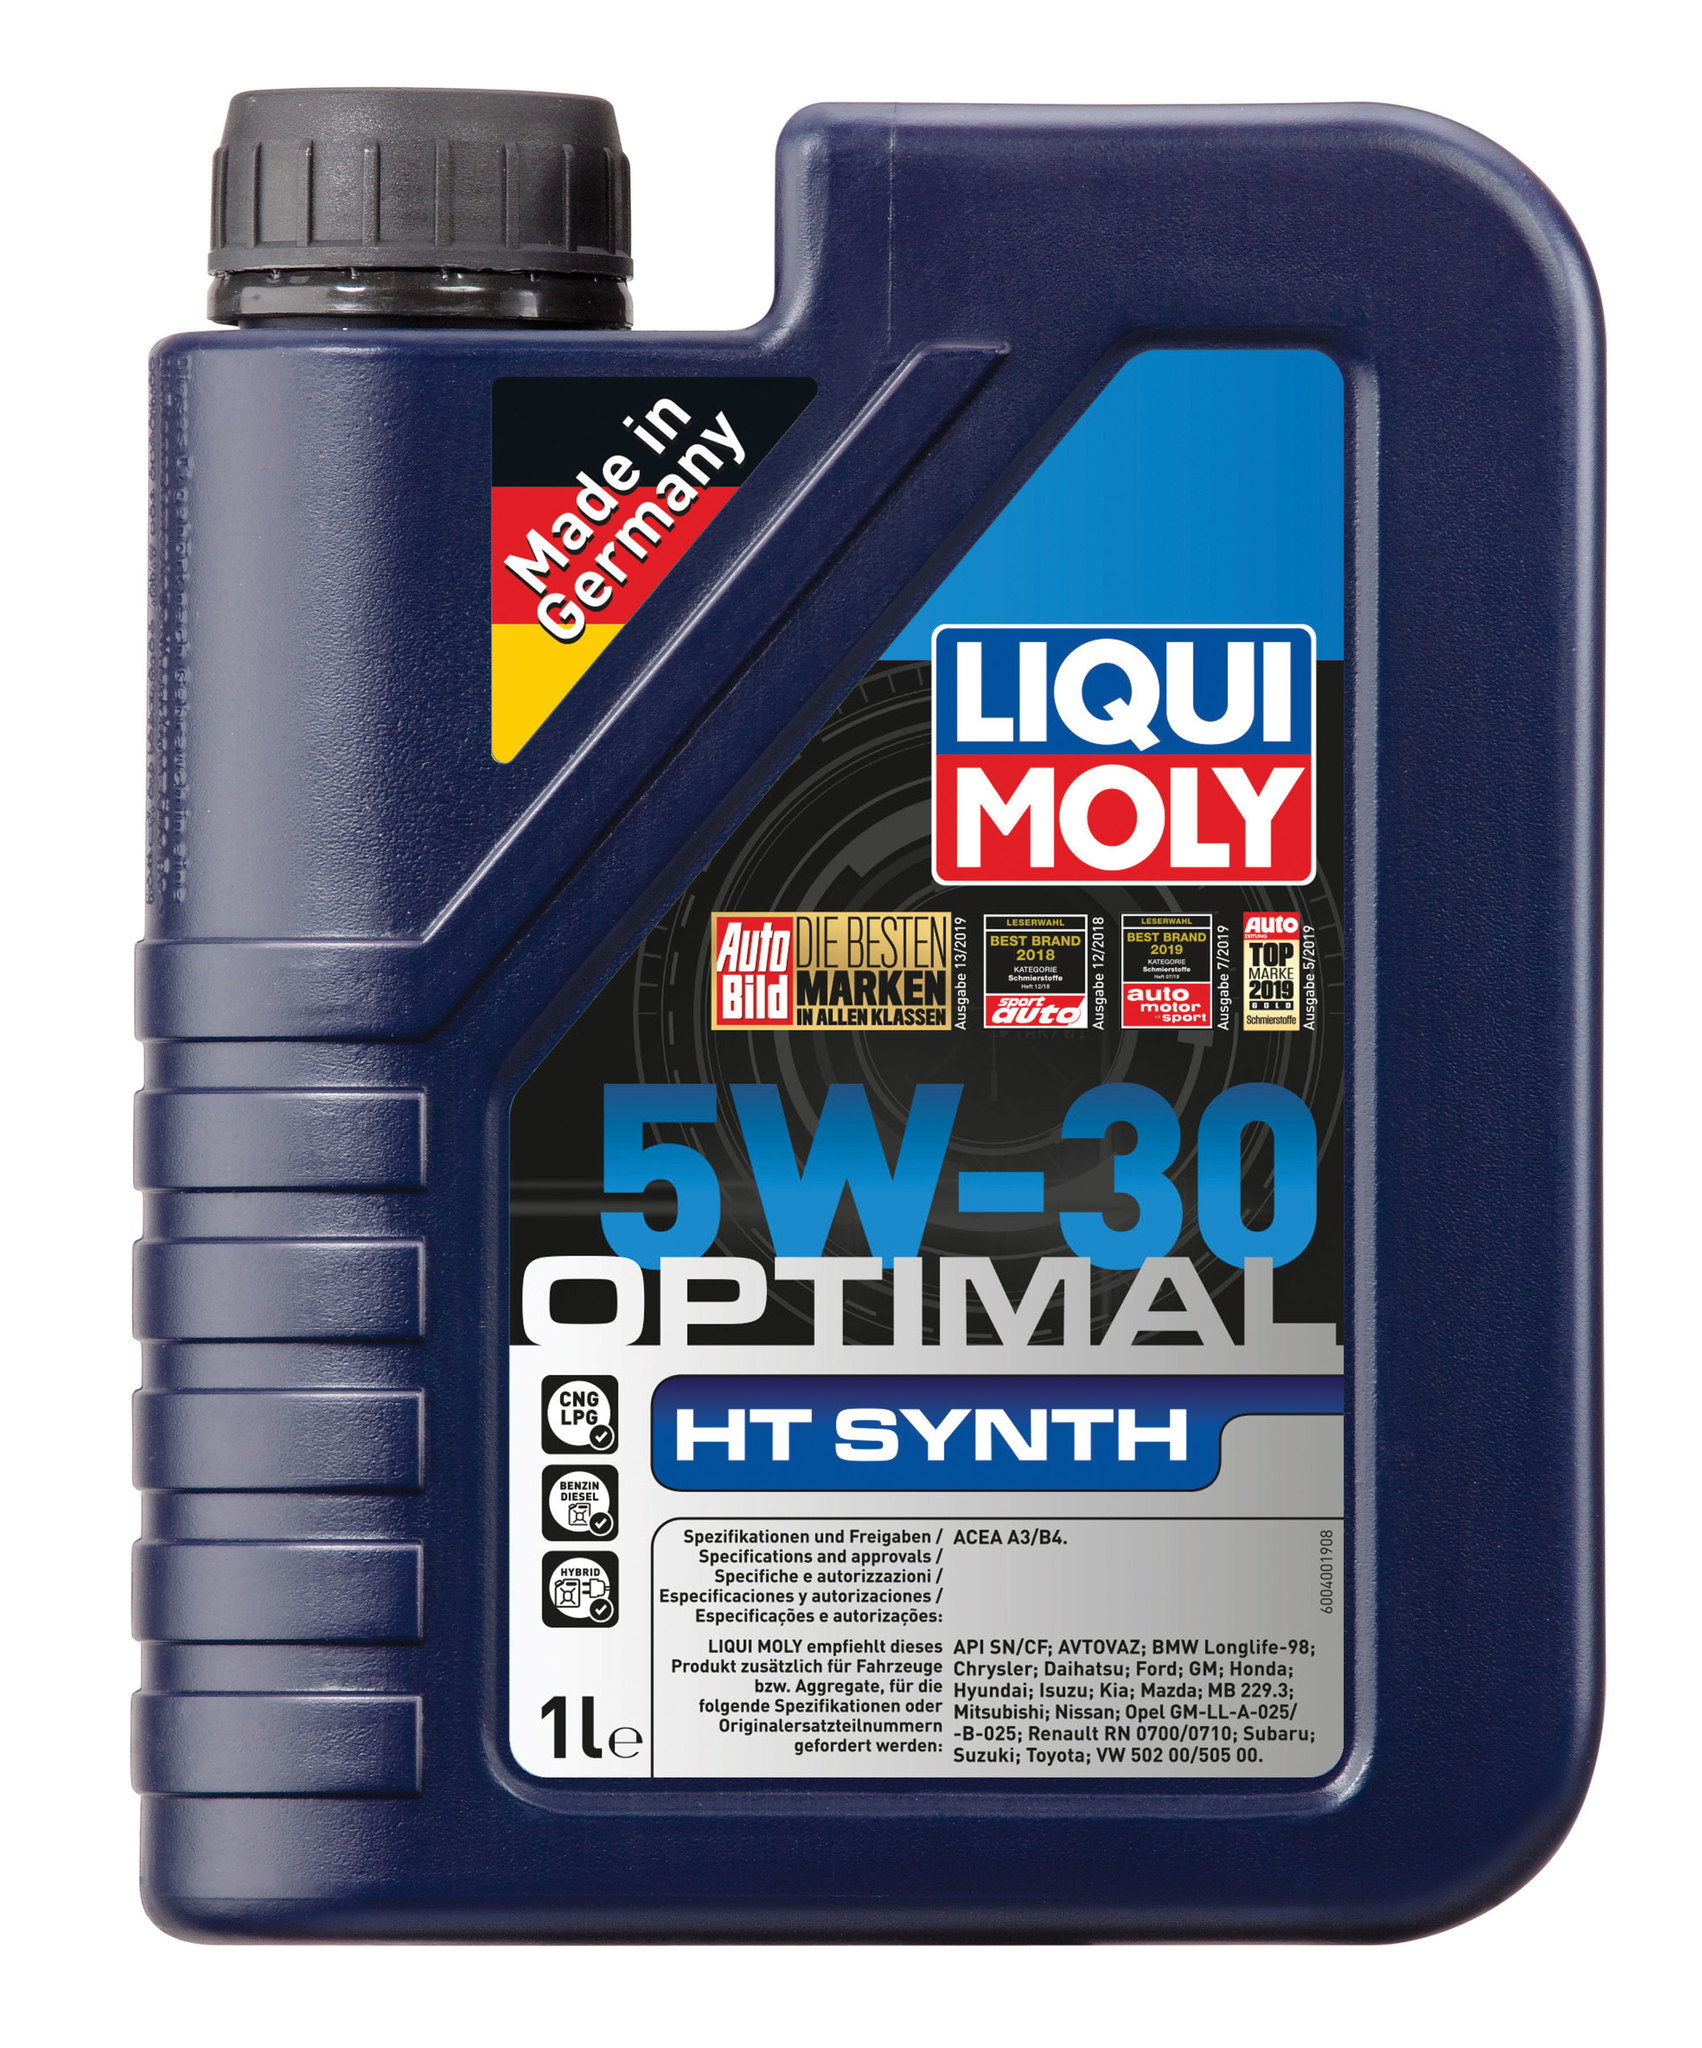 Liqui Moly Optimal HT Synth 5W-30 - НС-синтетическое моторное масло